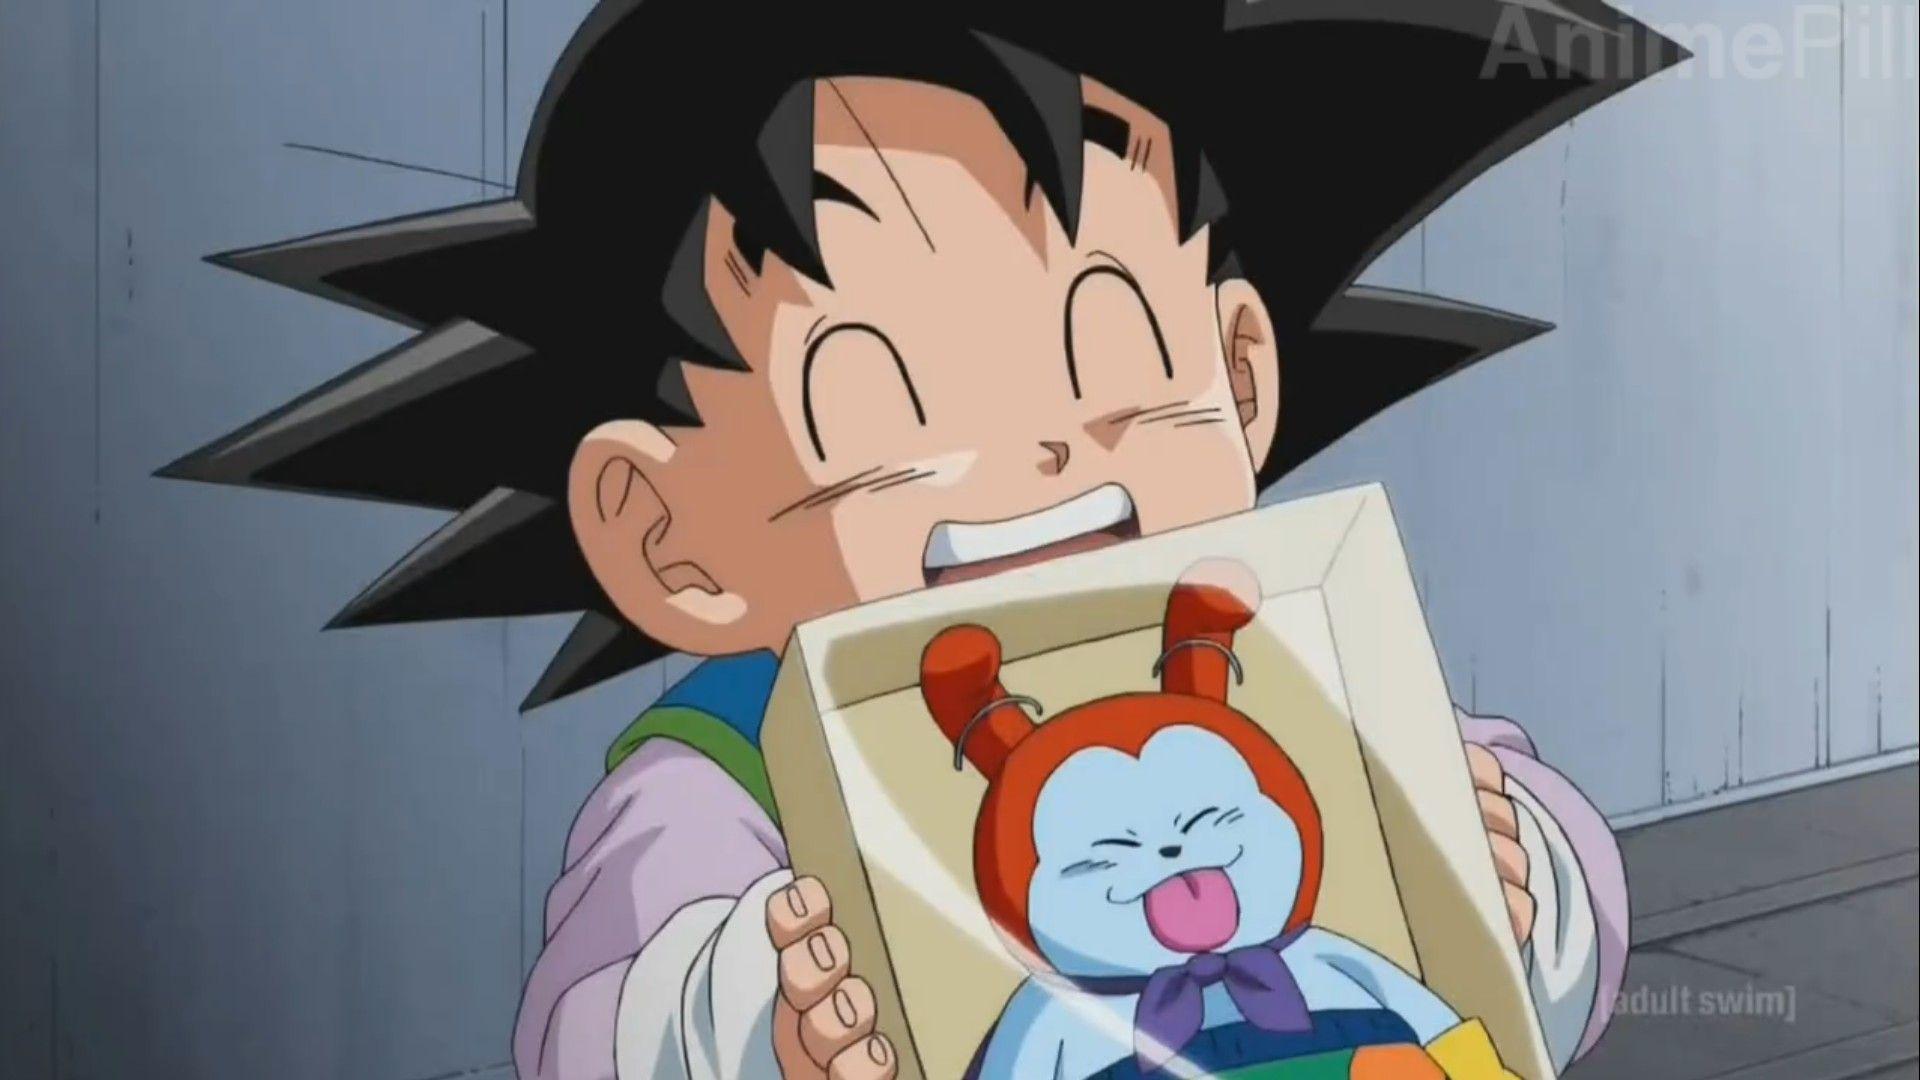 Goten Is Too Cute I Just Want To Hug Him Anime Dragon Ball Dragon Ball Gt Anime